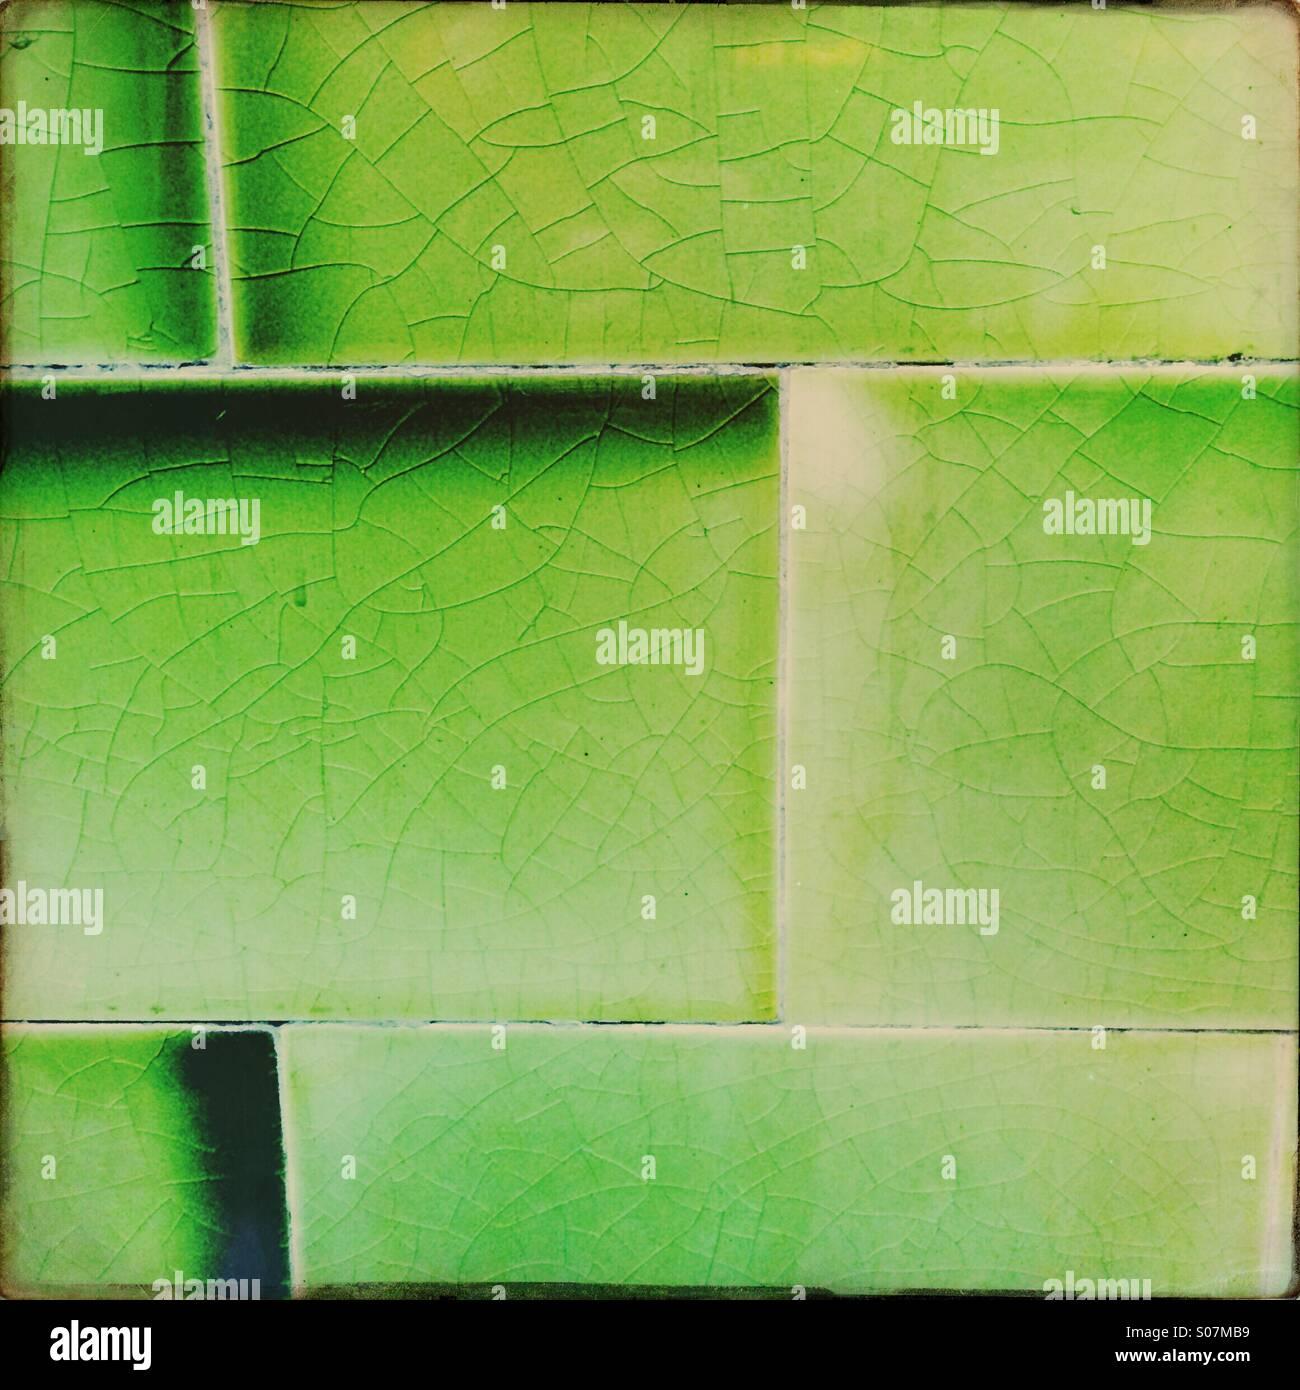 Green tiles wall - Stock Image